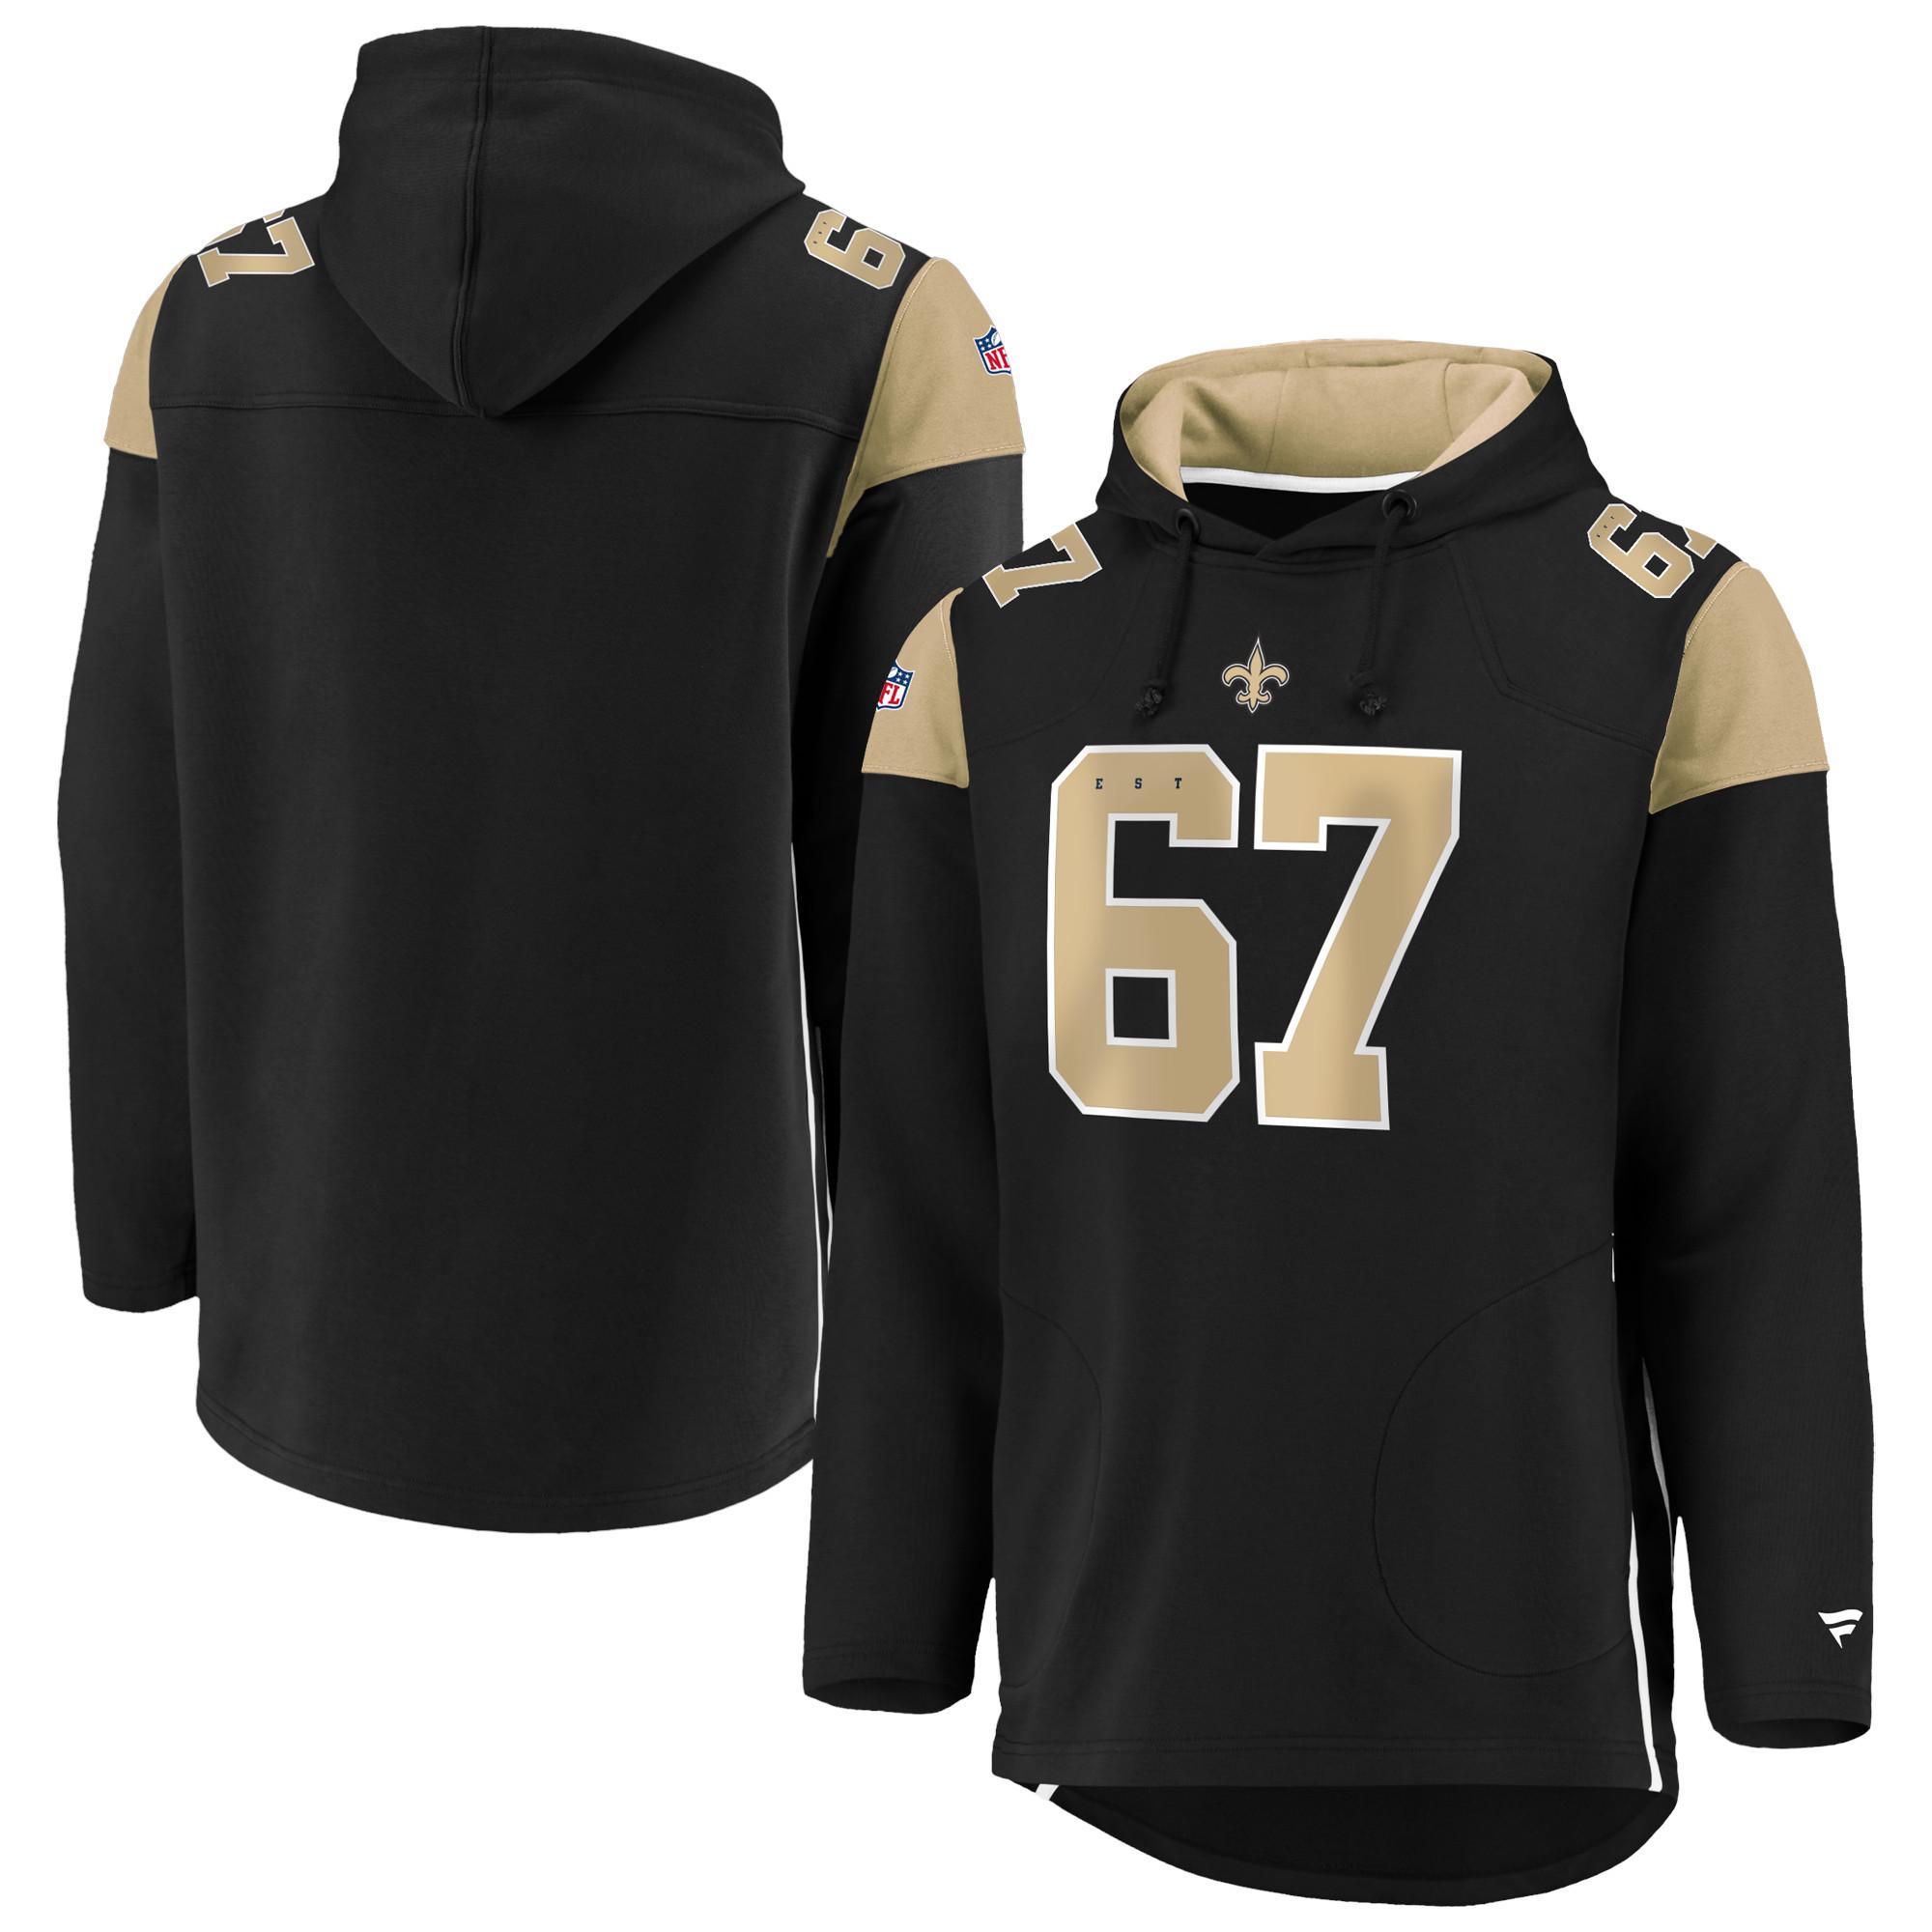 New Orleans Saints Franchise Hoodie - Black - Adult